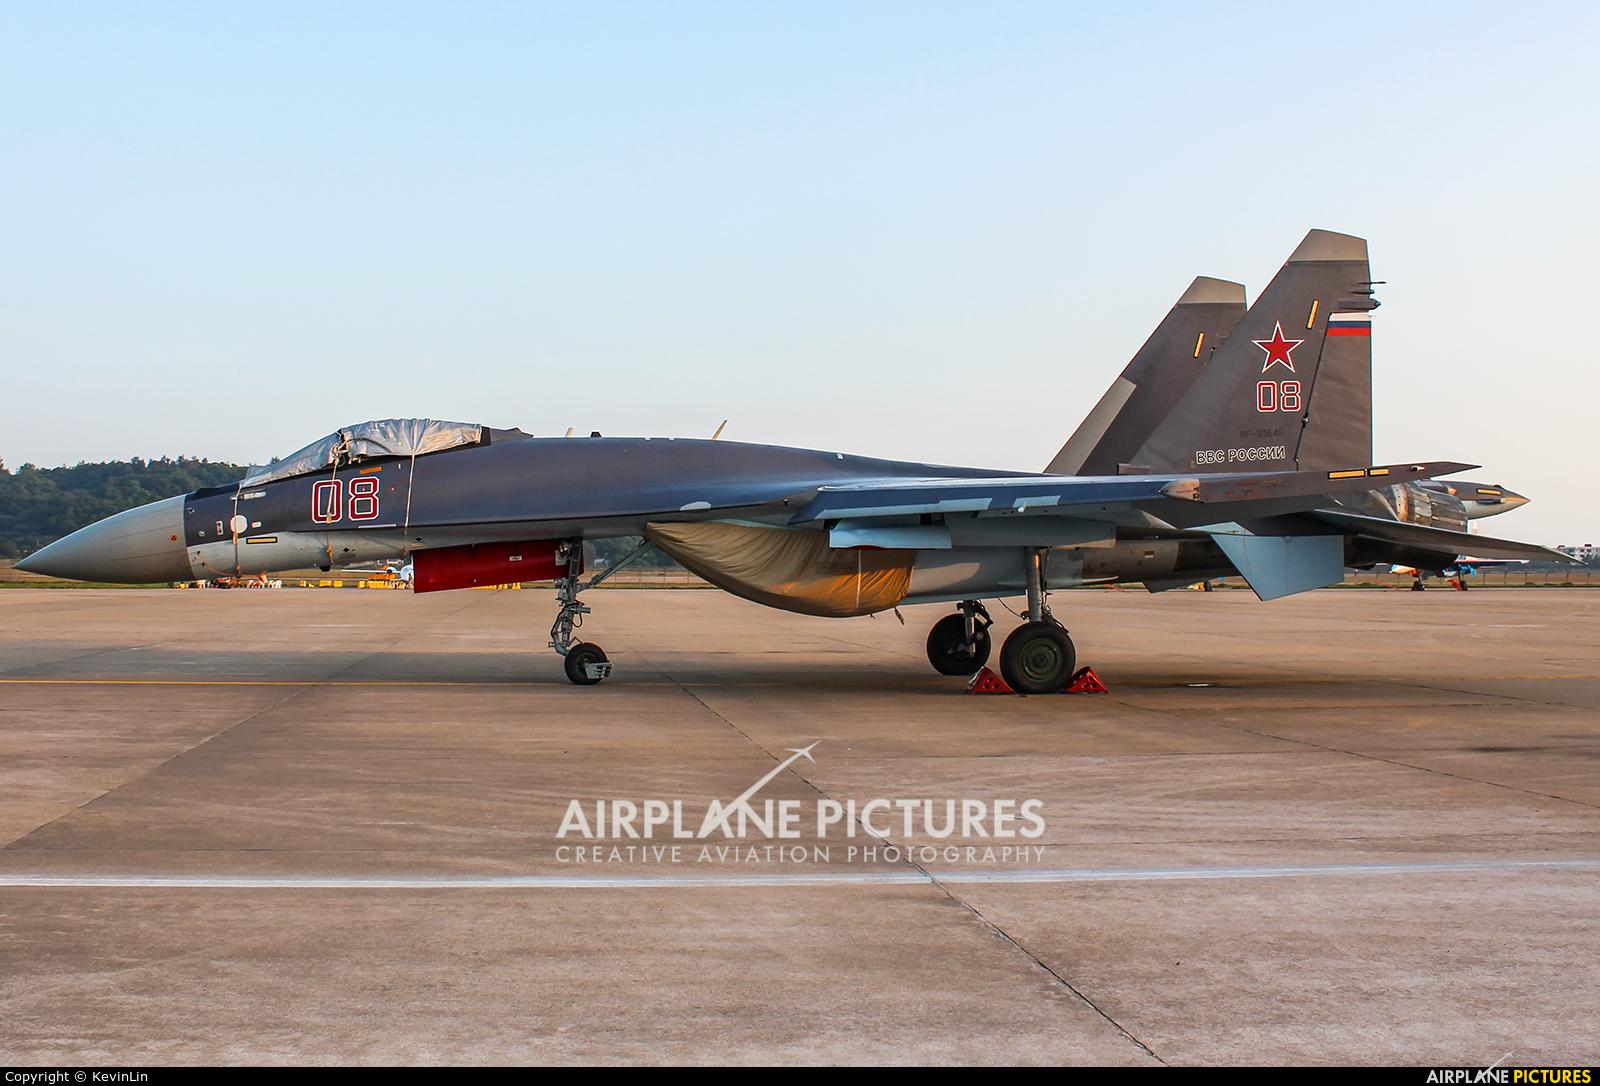 Russia - Air Force RF-93648 aircraft at Zhūhǎi-Jīnwān